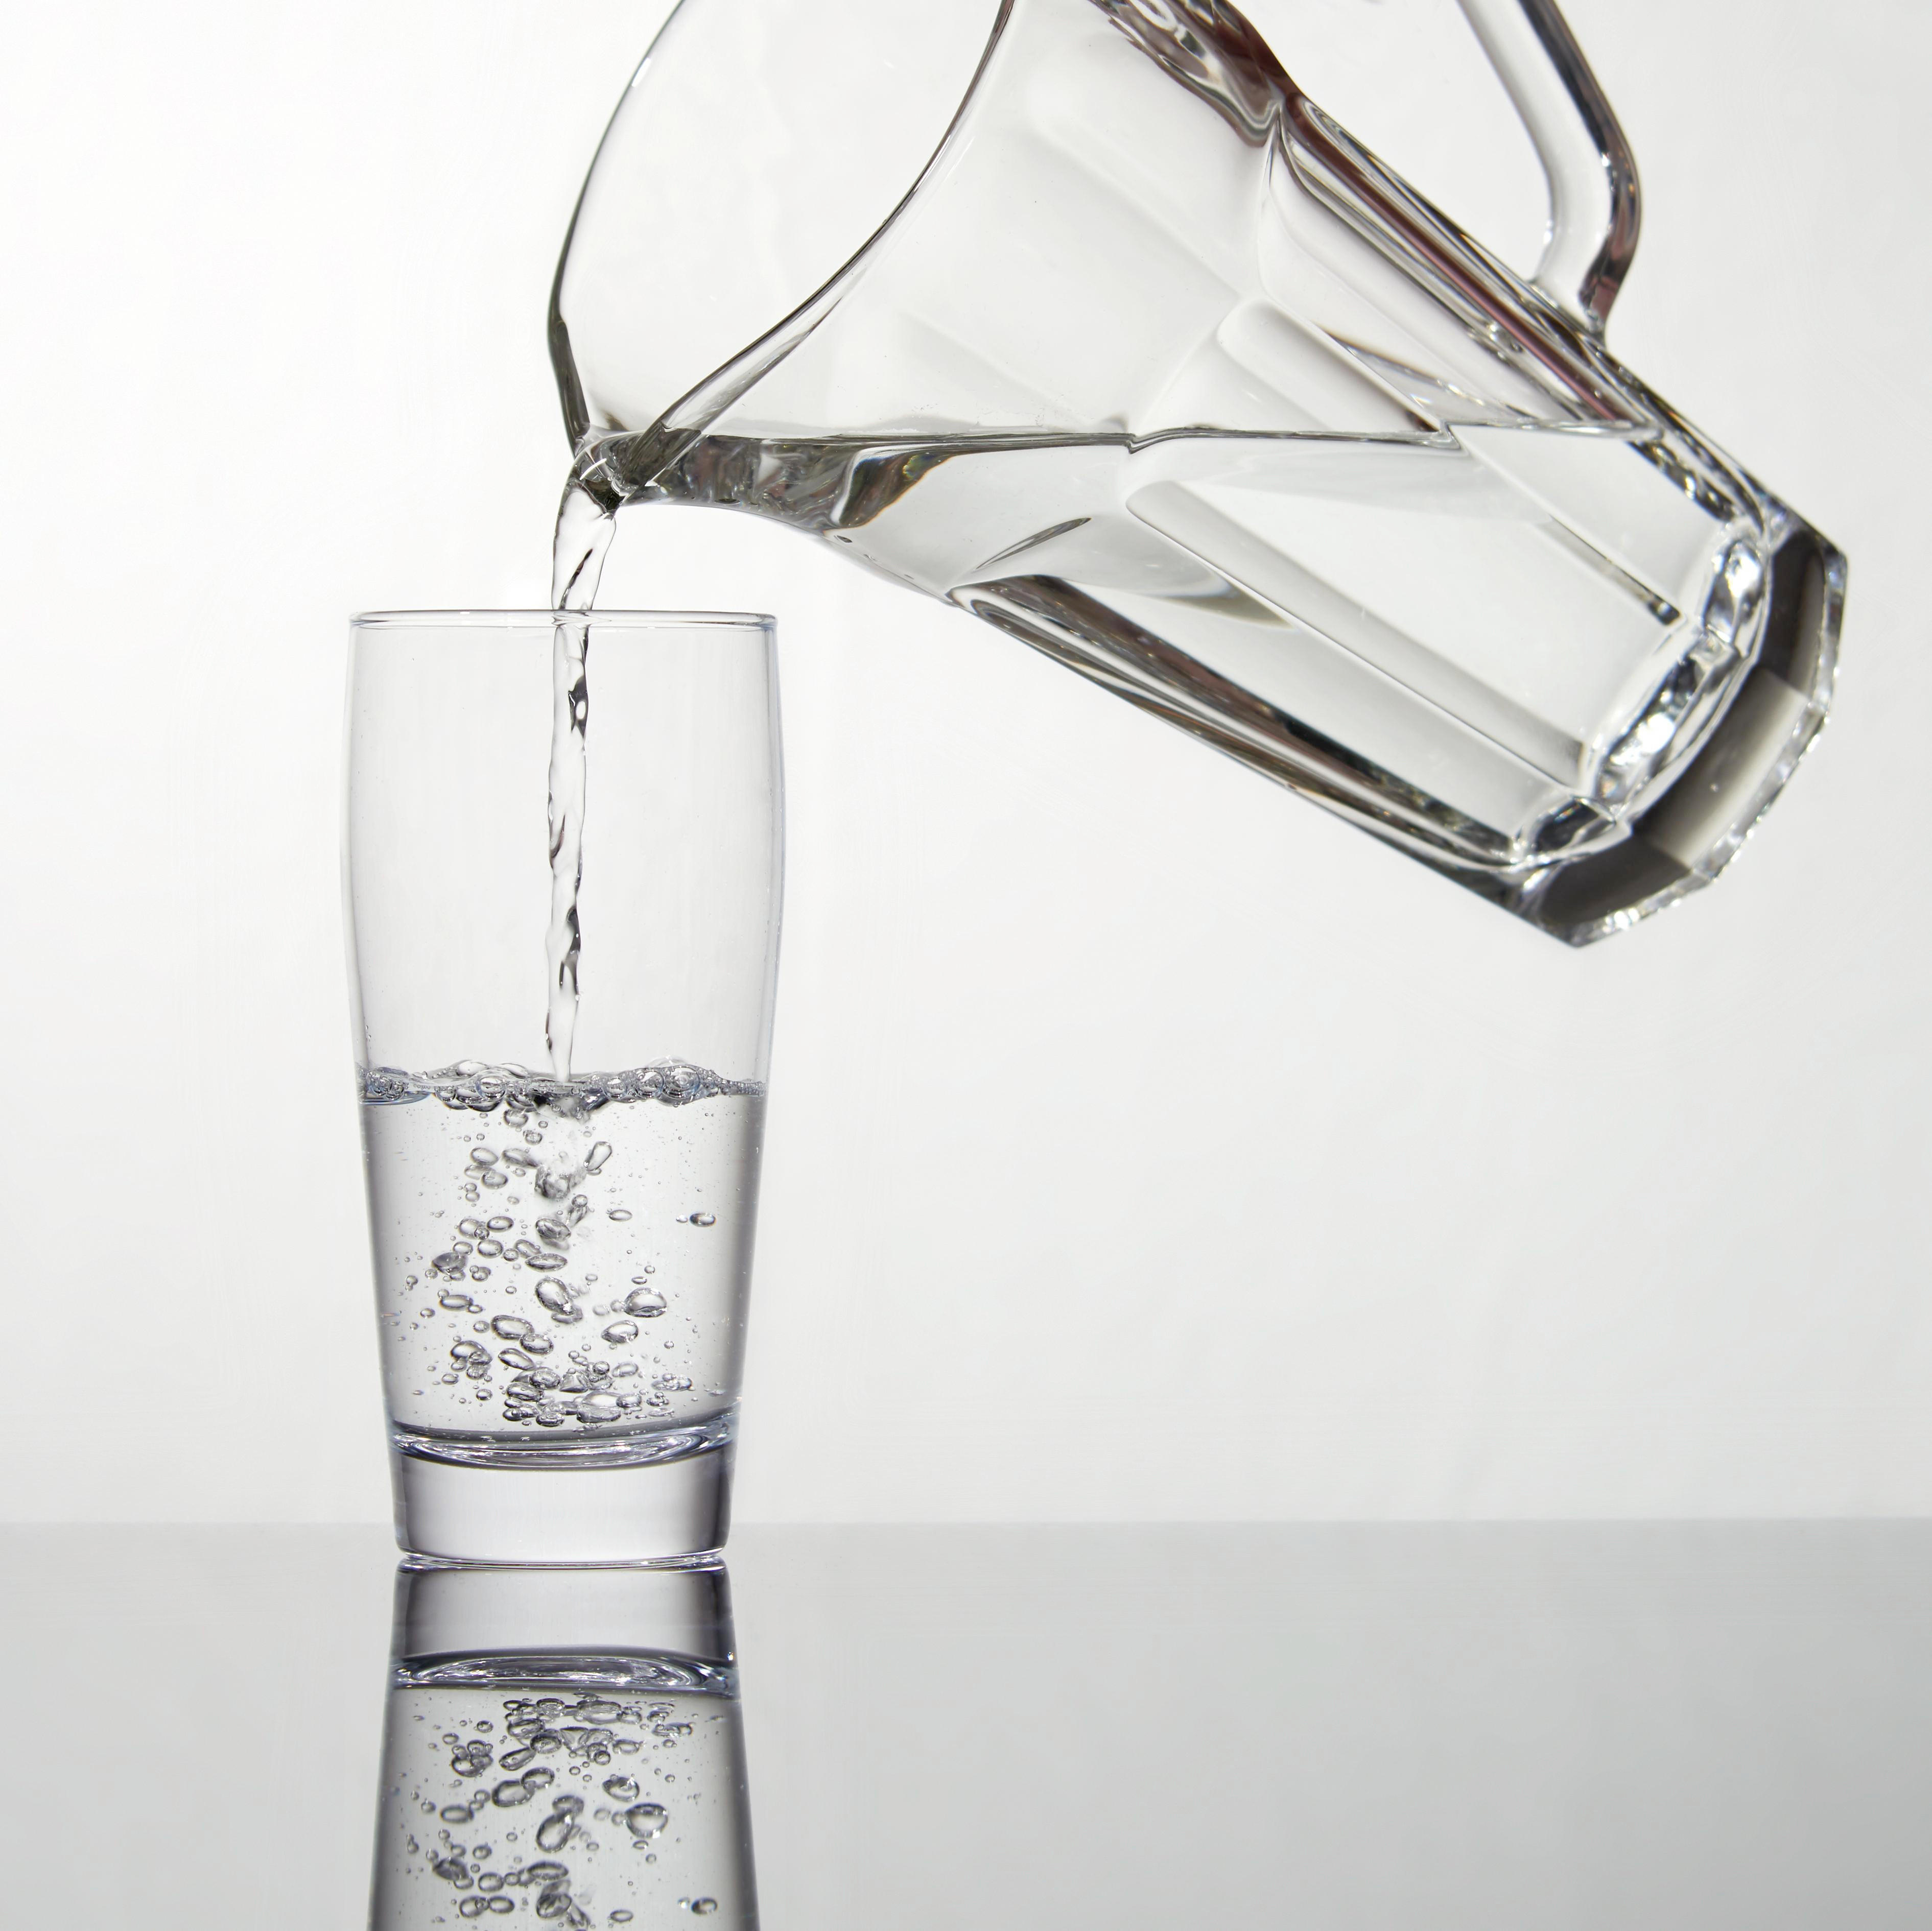 STAKLENI VRČ - prozirno, Konvencionalno, staklo (23cm) - HOMEWARE